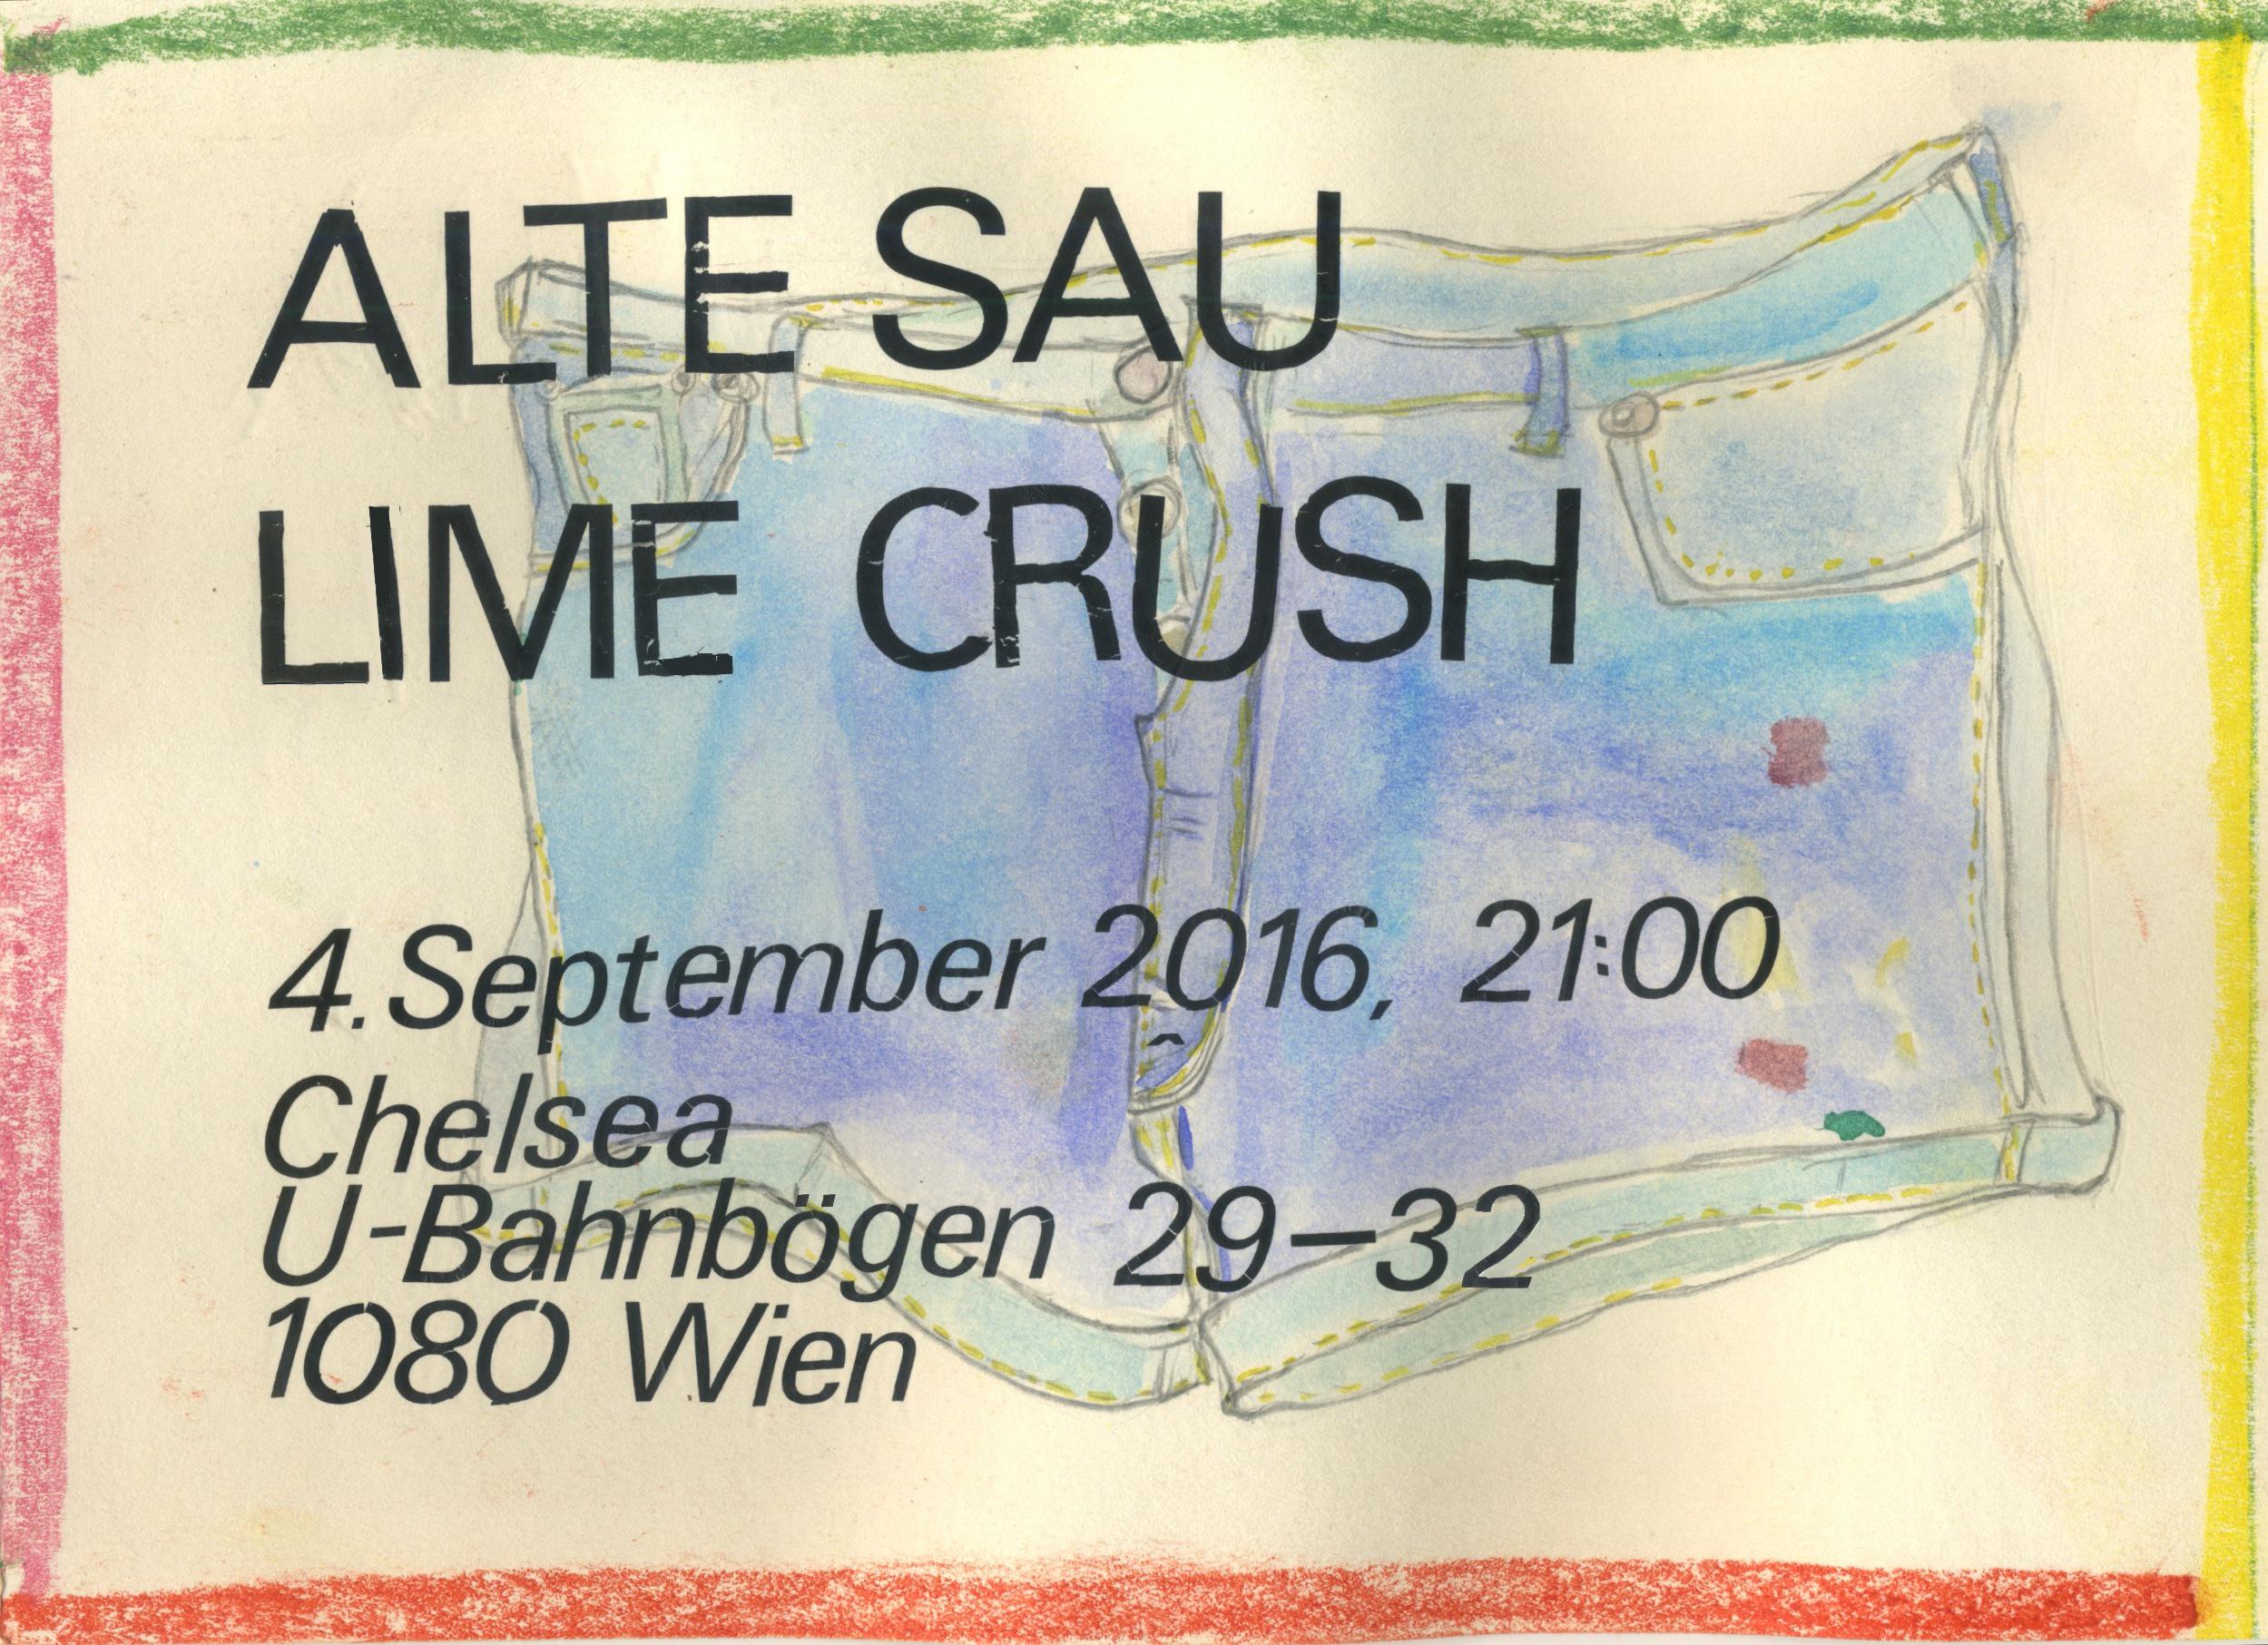 Alte Sau | Lime Crush